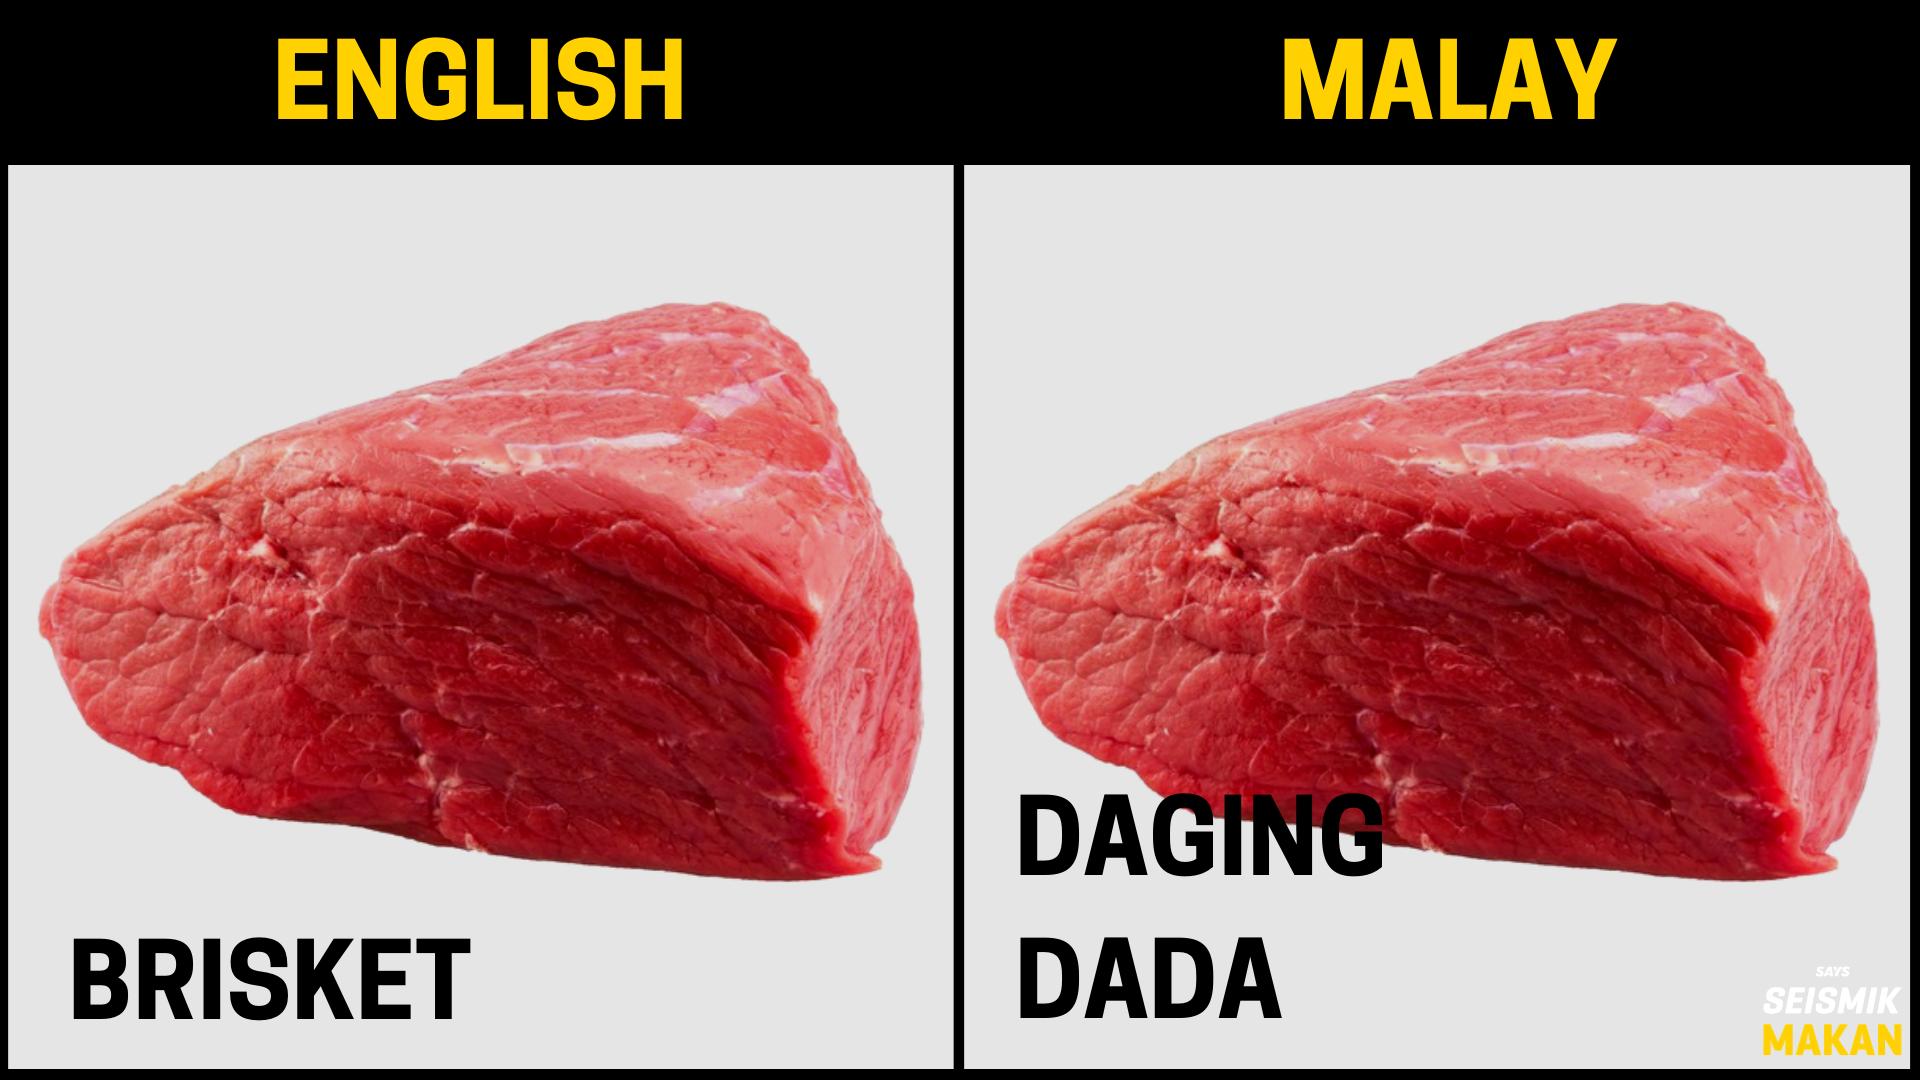 Daging Brisket Bahasa Melayu